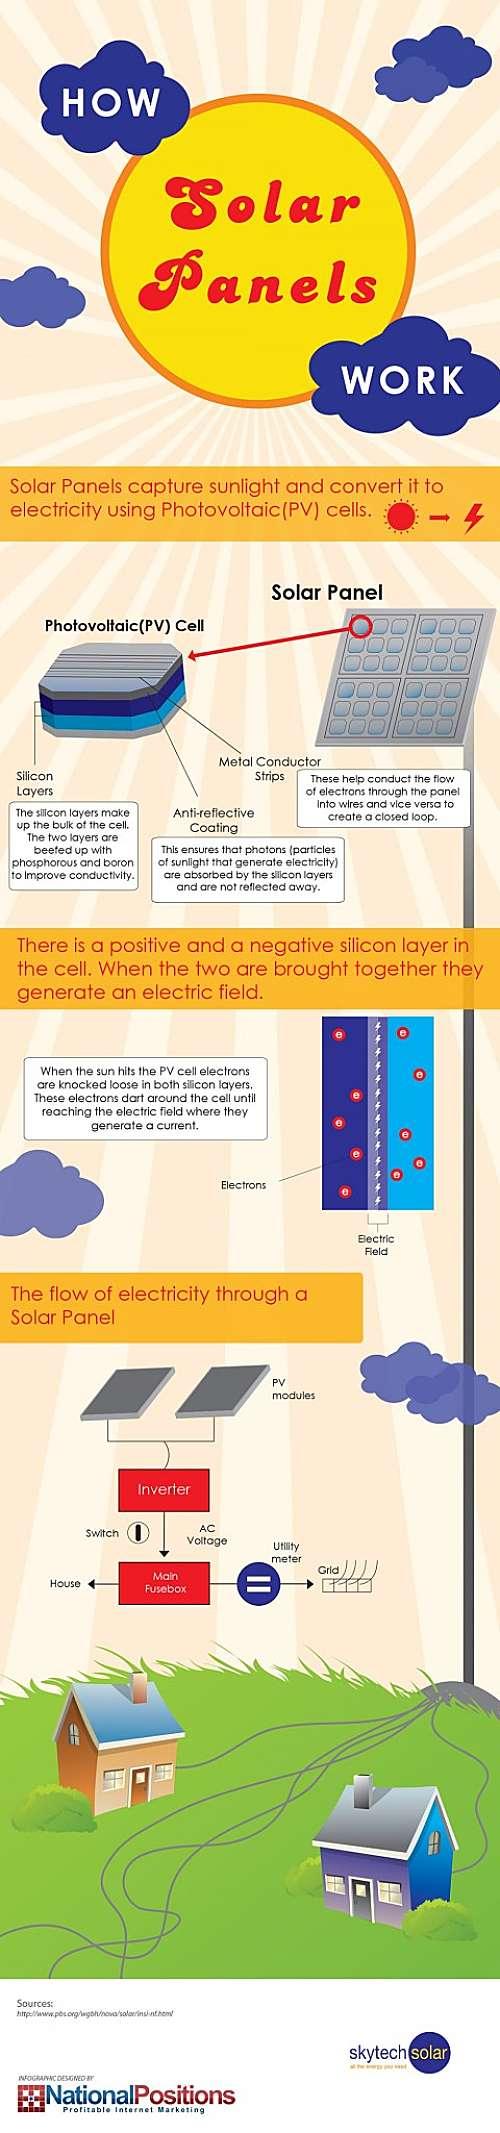 how solar panels work infographic